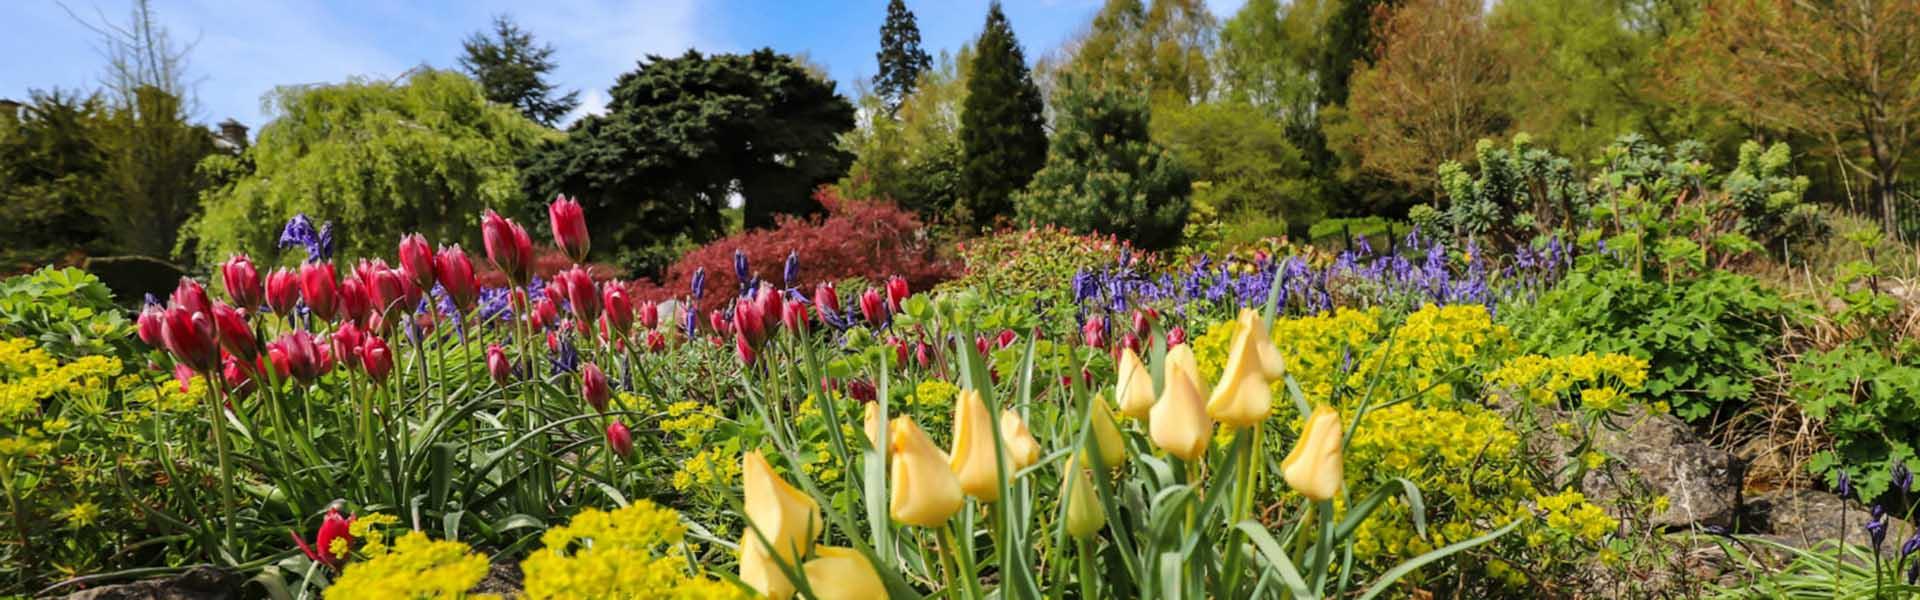 Spring flowers in bloom at Emmetts Garden